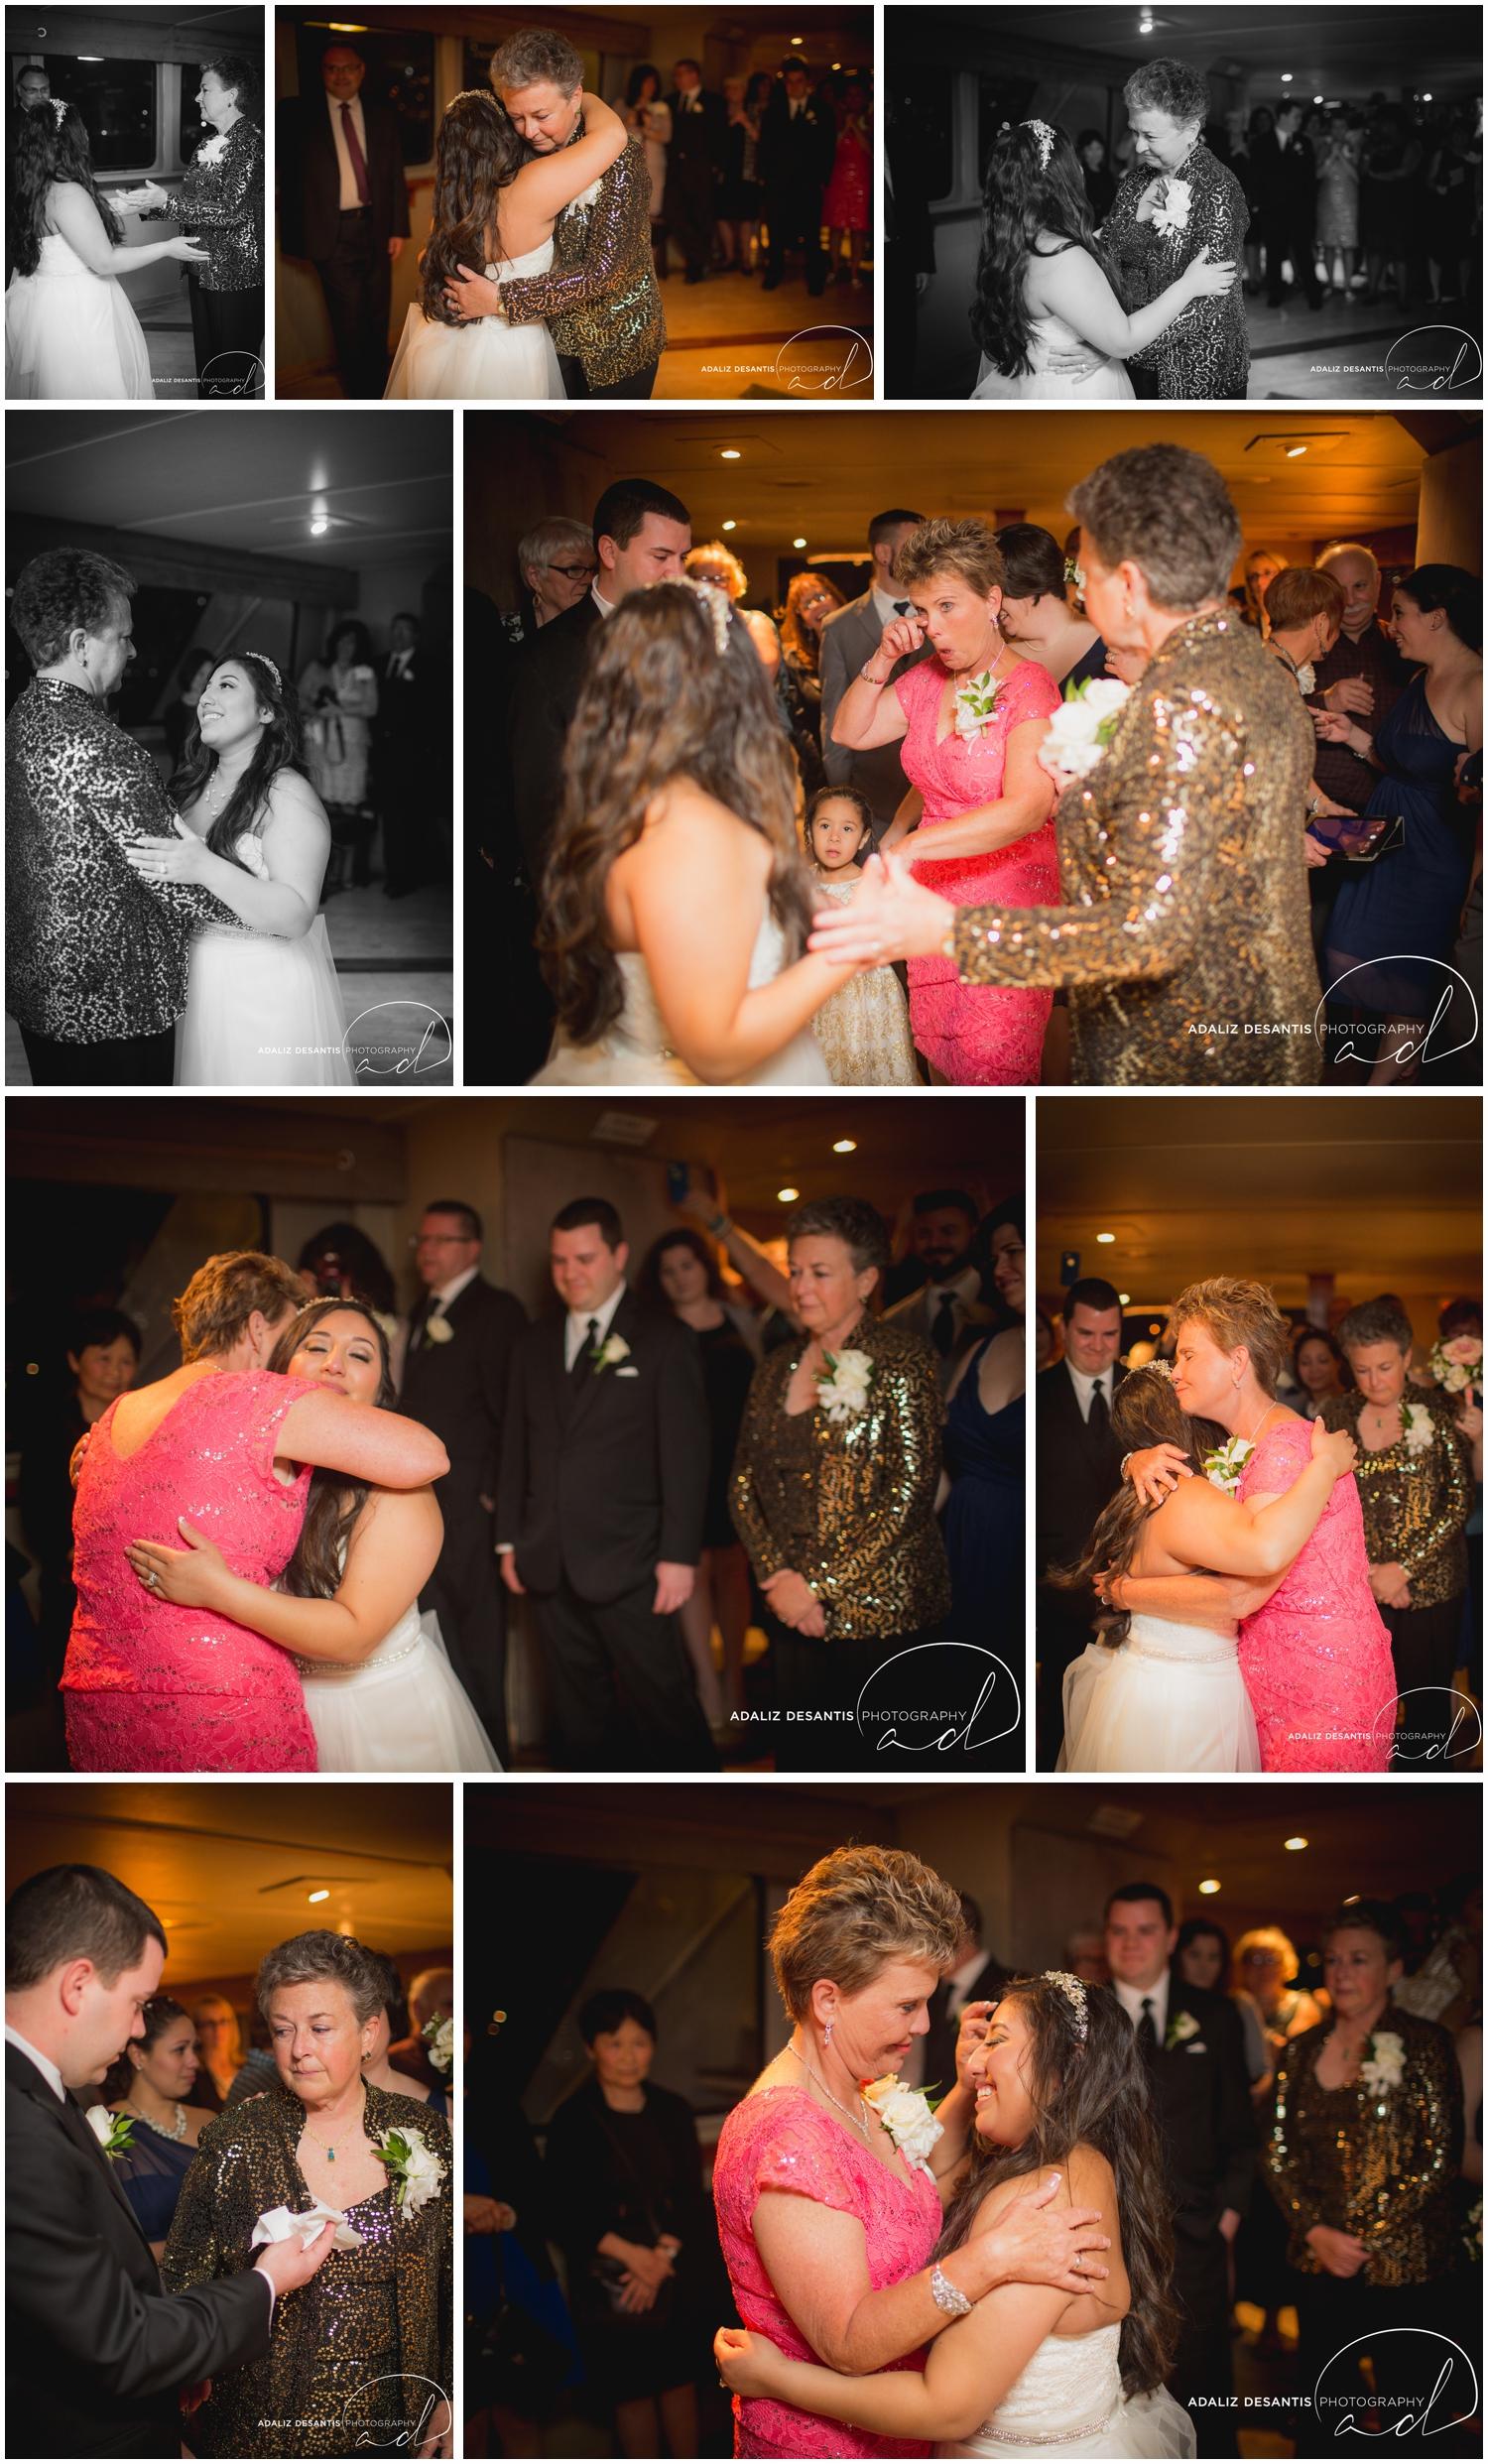 Taylor and amanda Indiana Fort Lauderdale Sun Dream yacht charter wedding 17